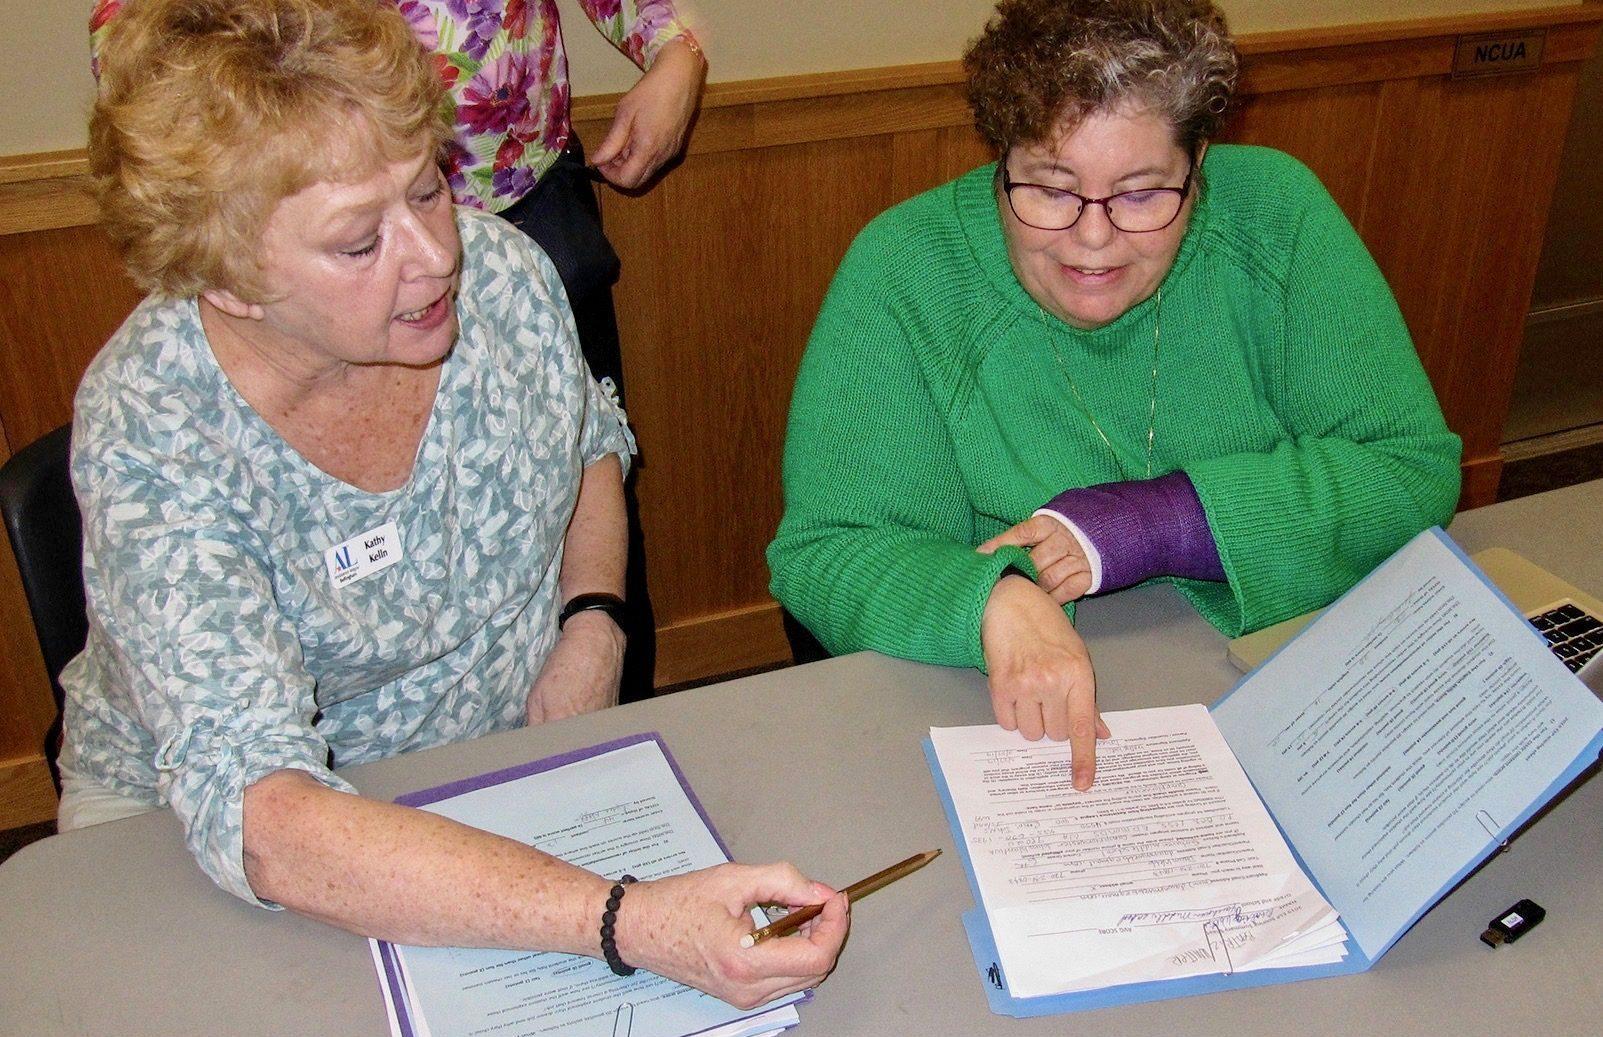 Scoring applications for the Enrichment Scholarship Program